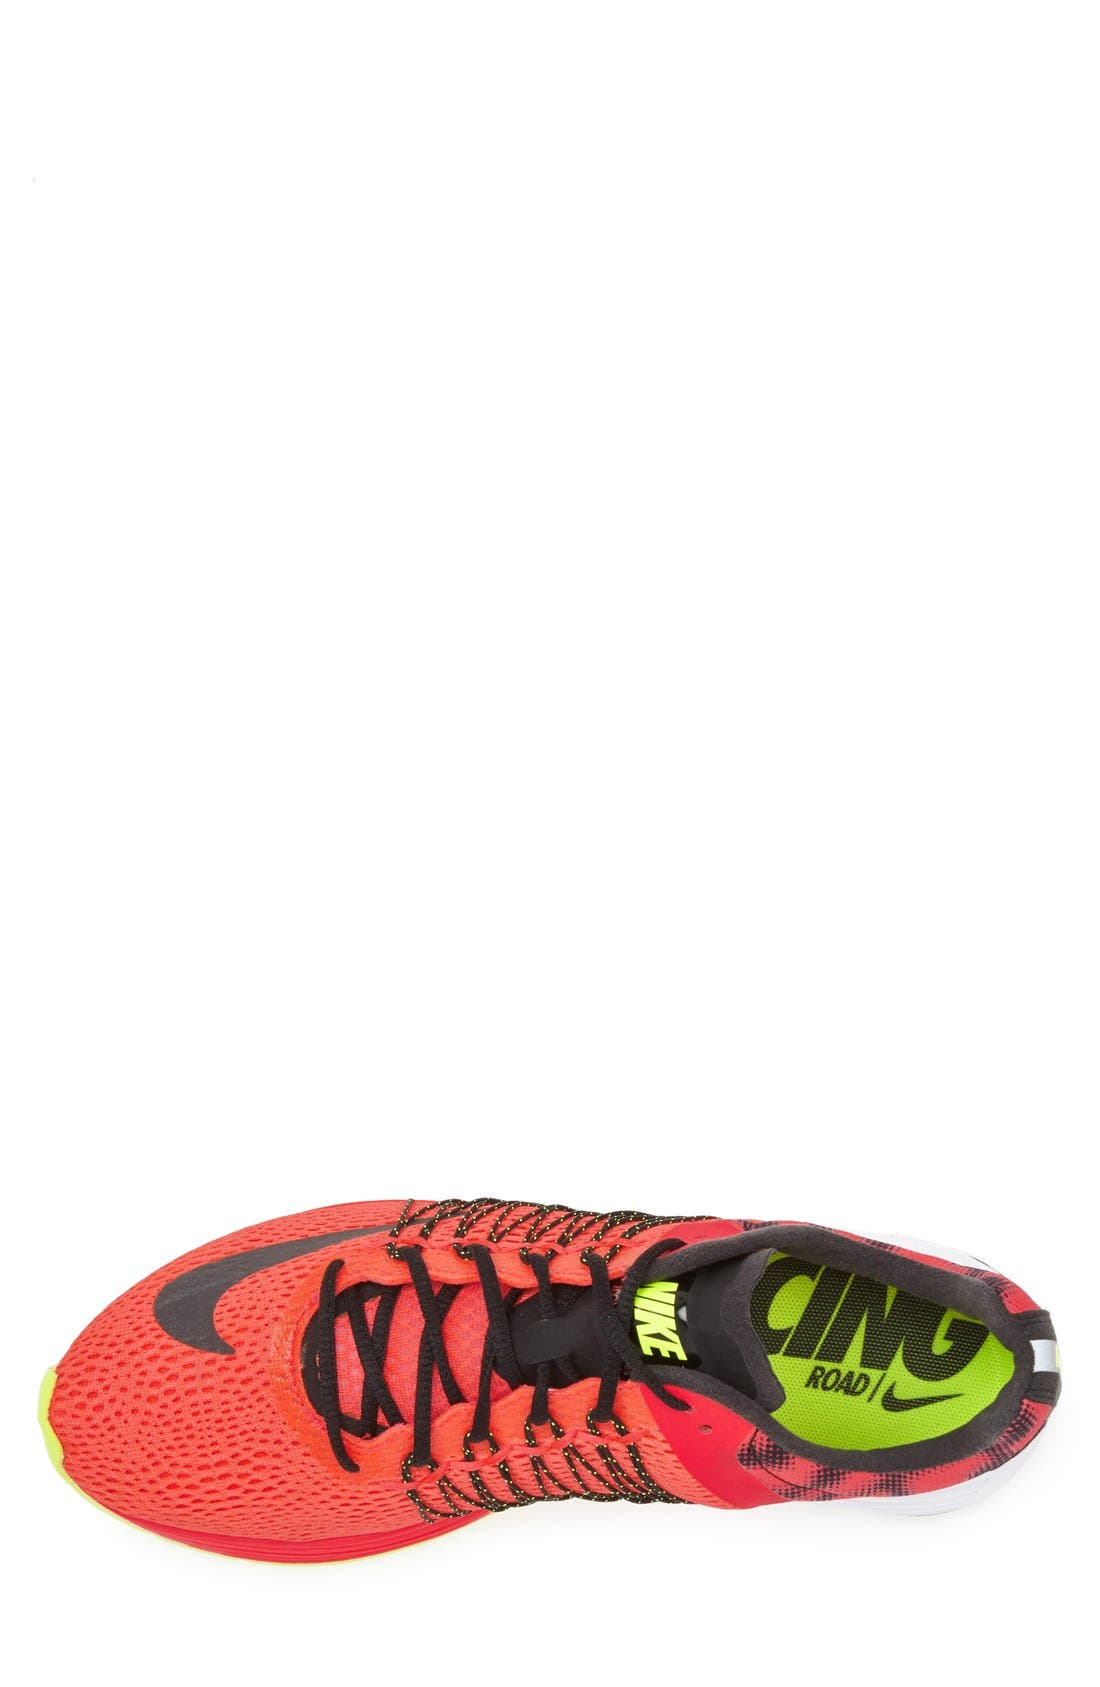 Alternate Image 3  - Nike 'Zoom Streak 5' Running Shoe (Men)